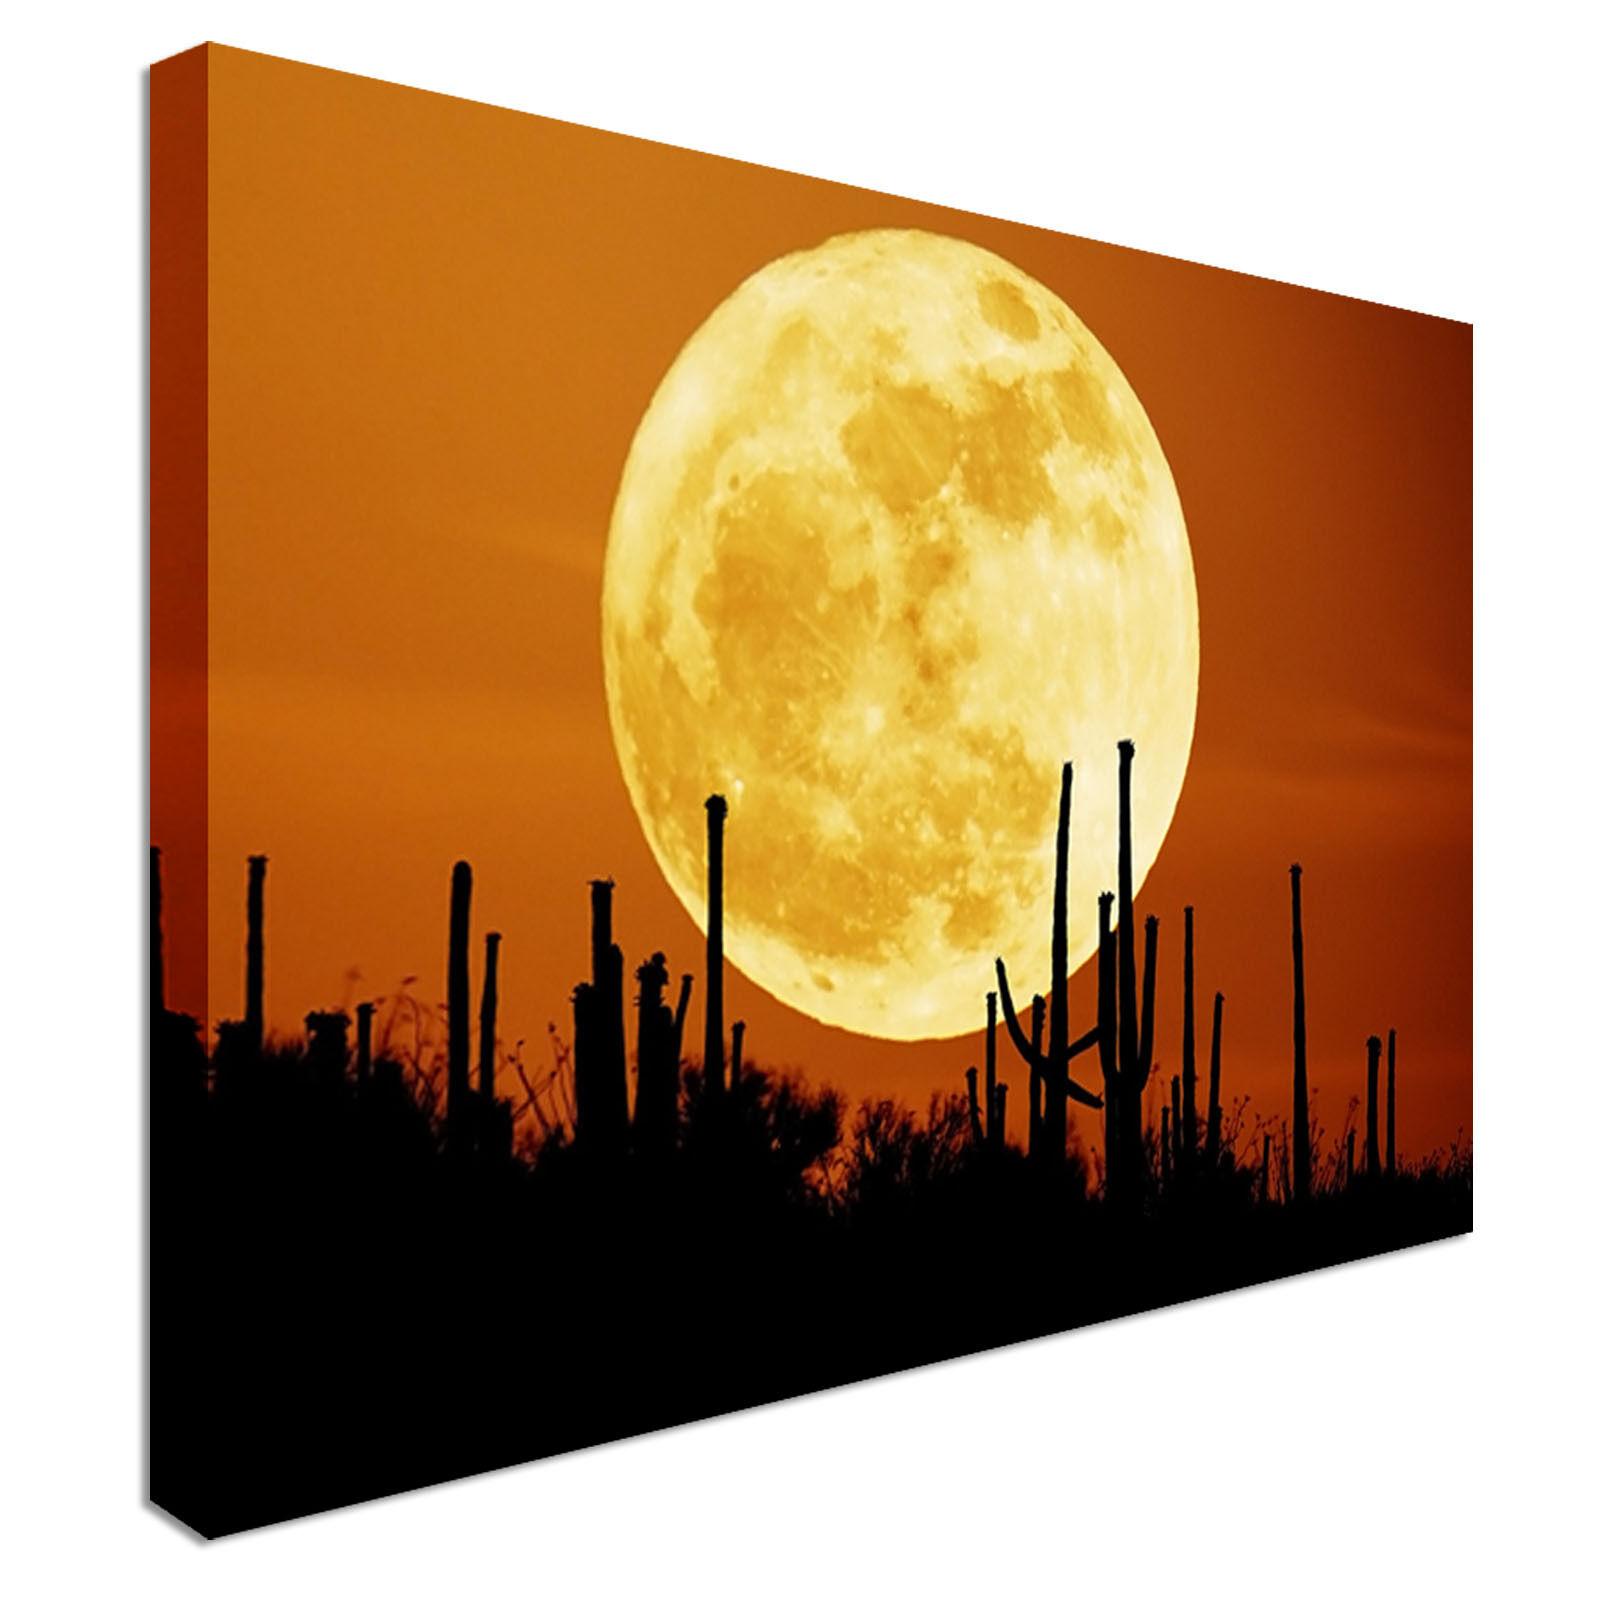 Large Moon Weiß Canvas Wall Art Print Large + Any Größe